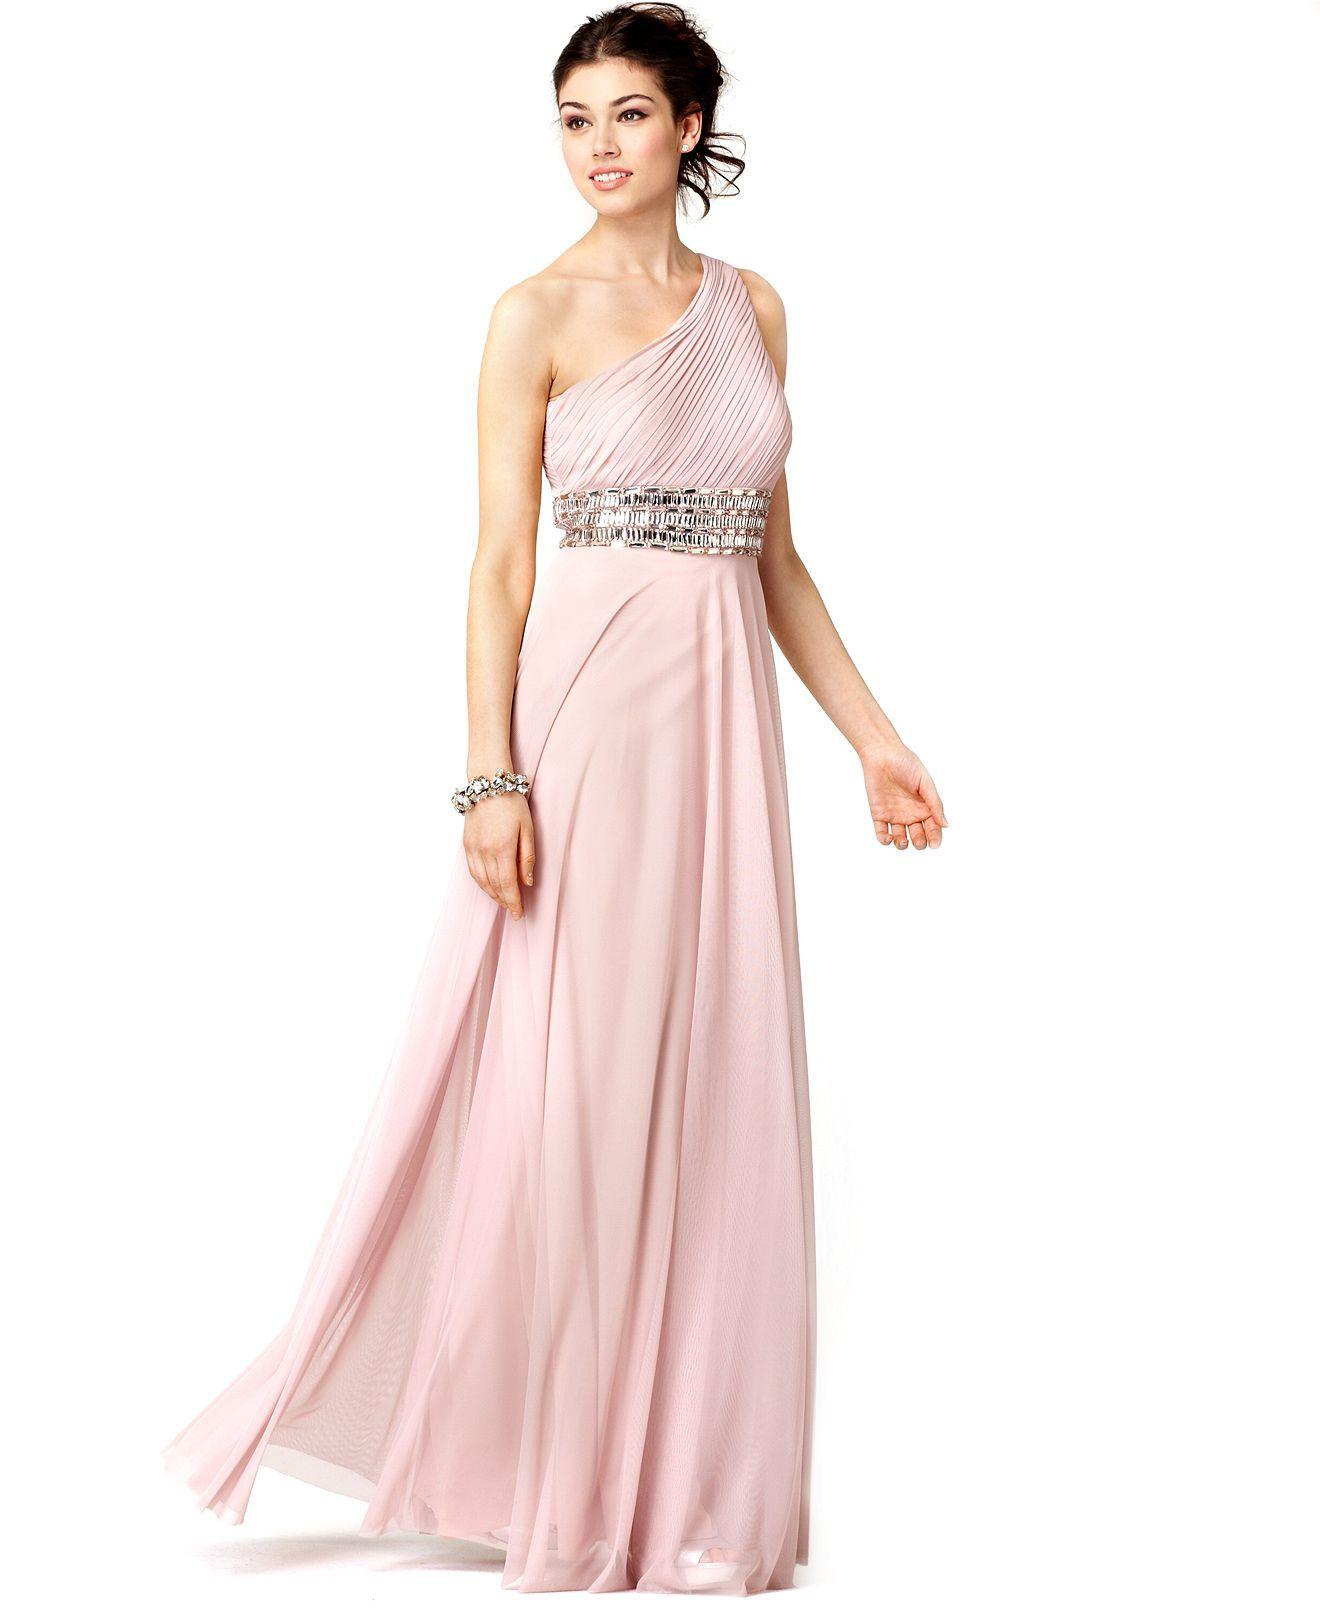 Js Collections Dress Sleeveless One Shoulder Beaded Empire Waist